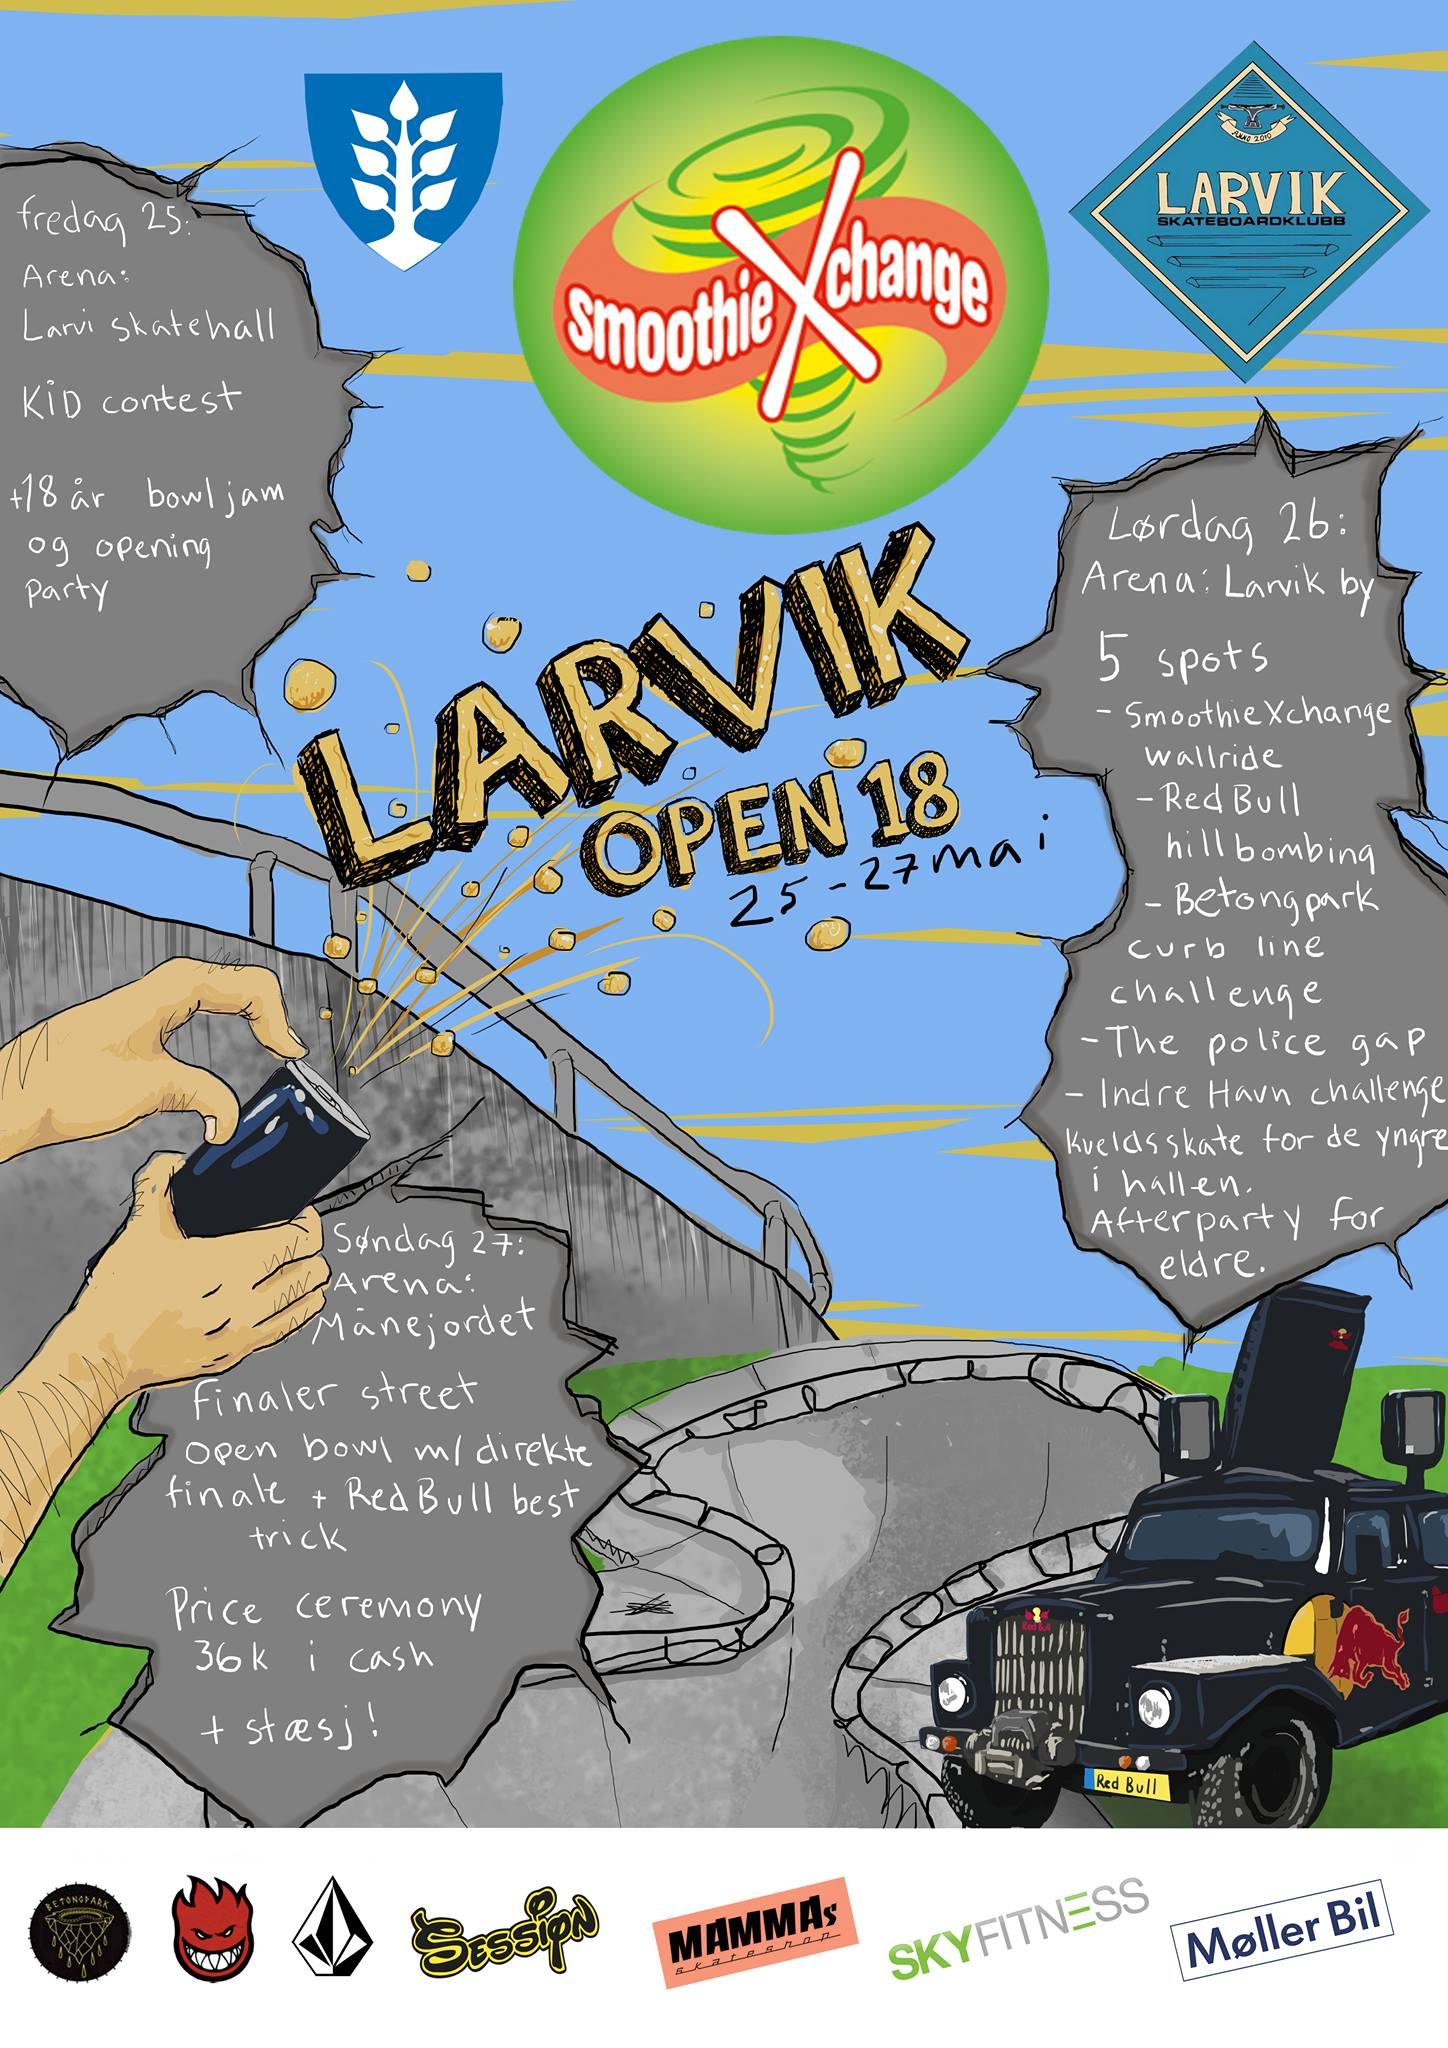 larvik-open